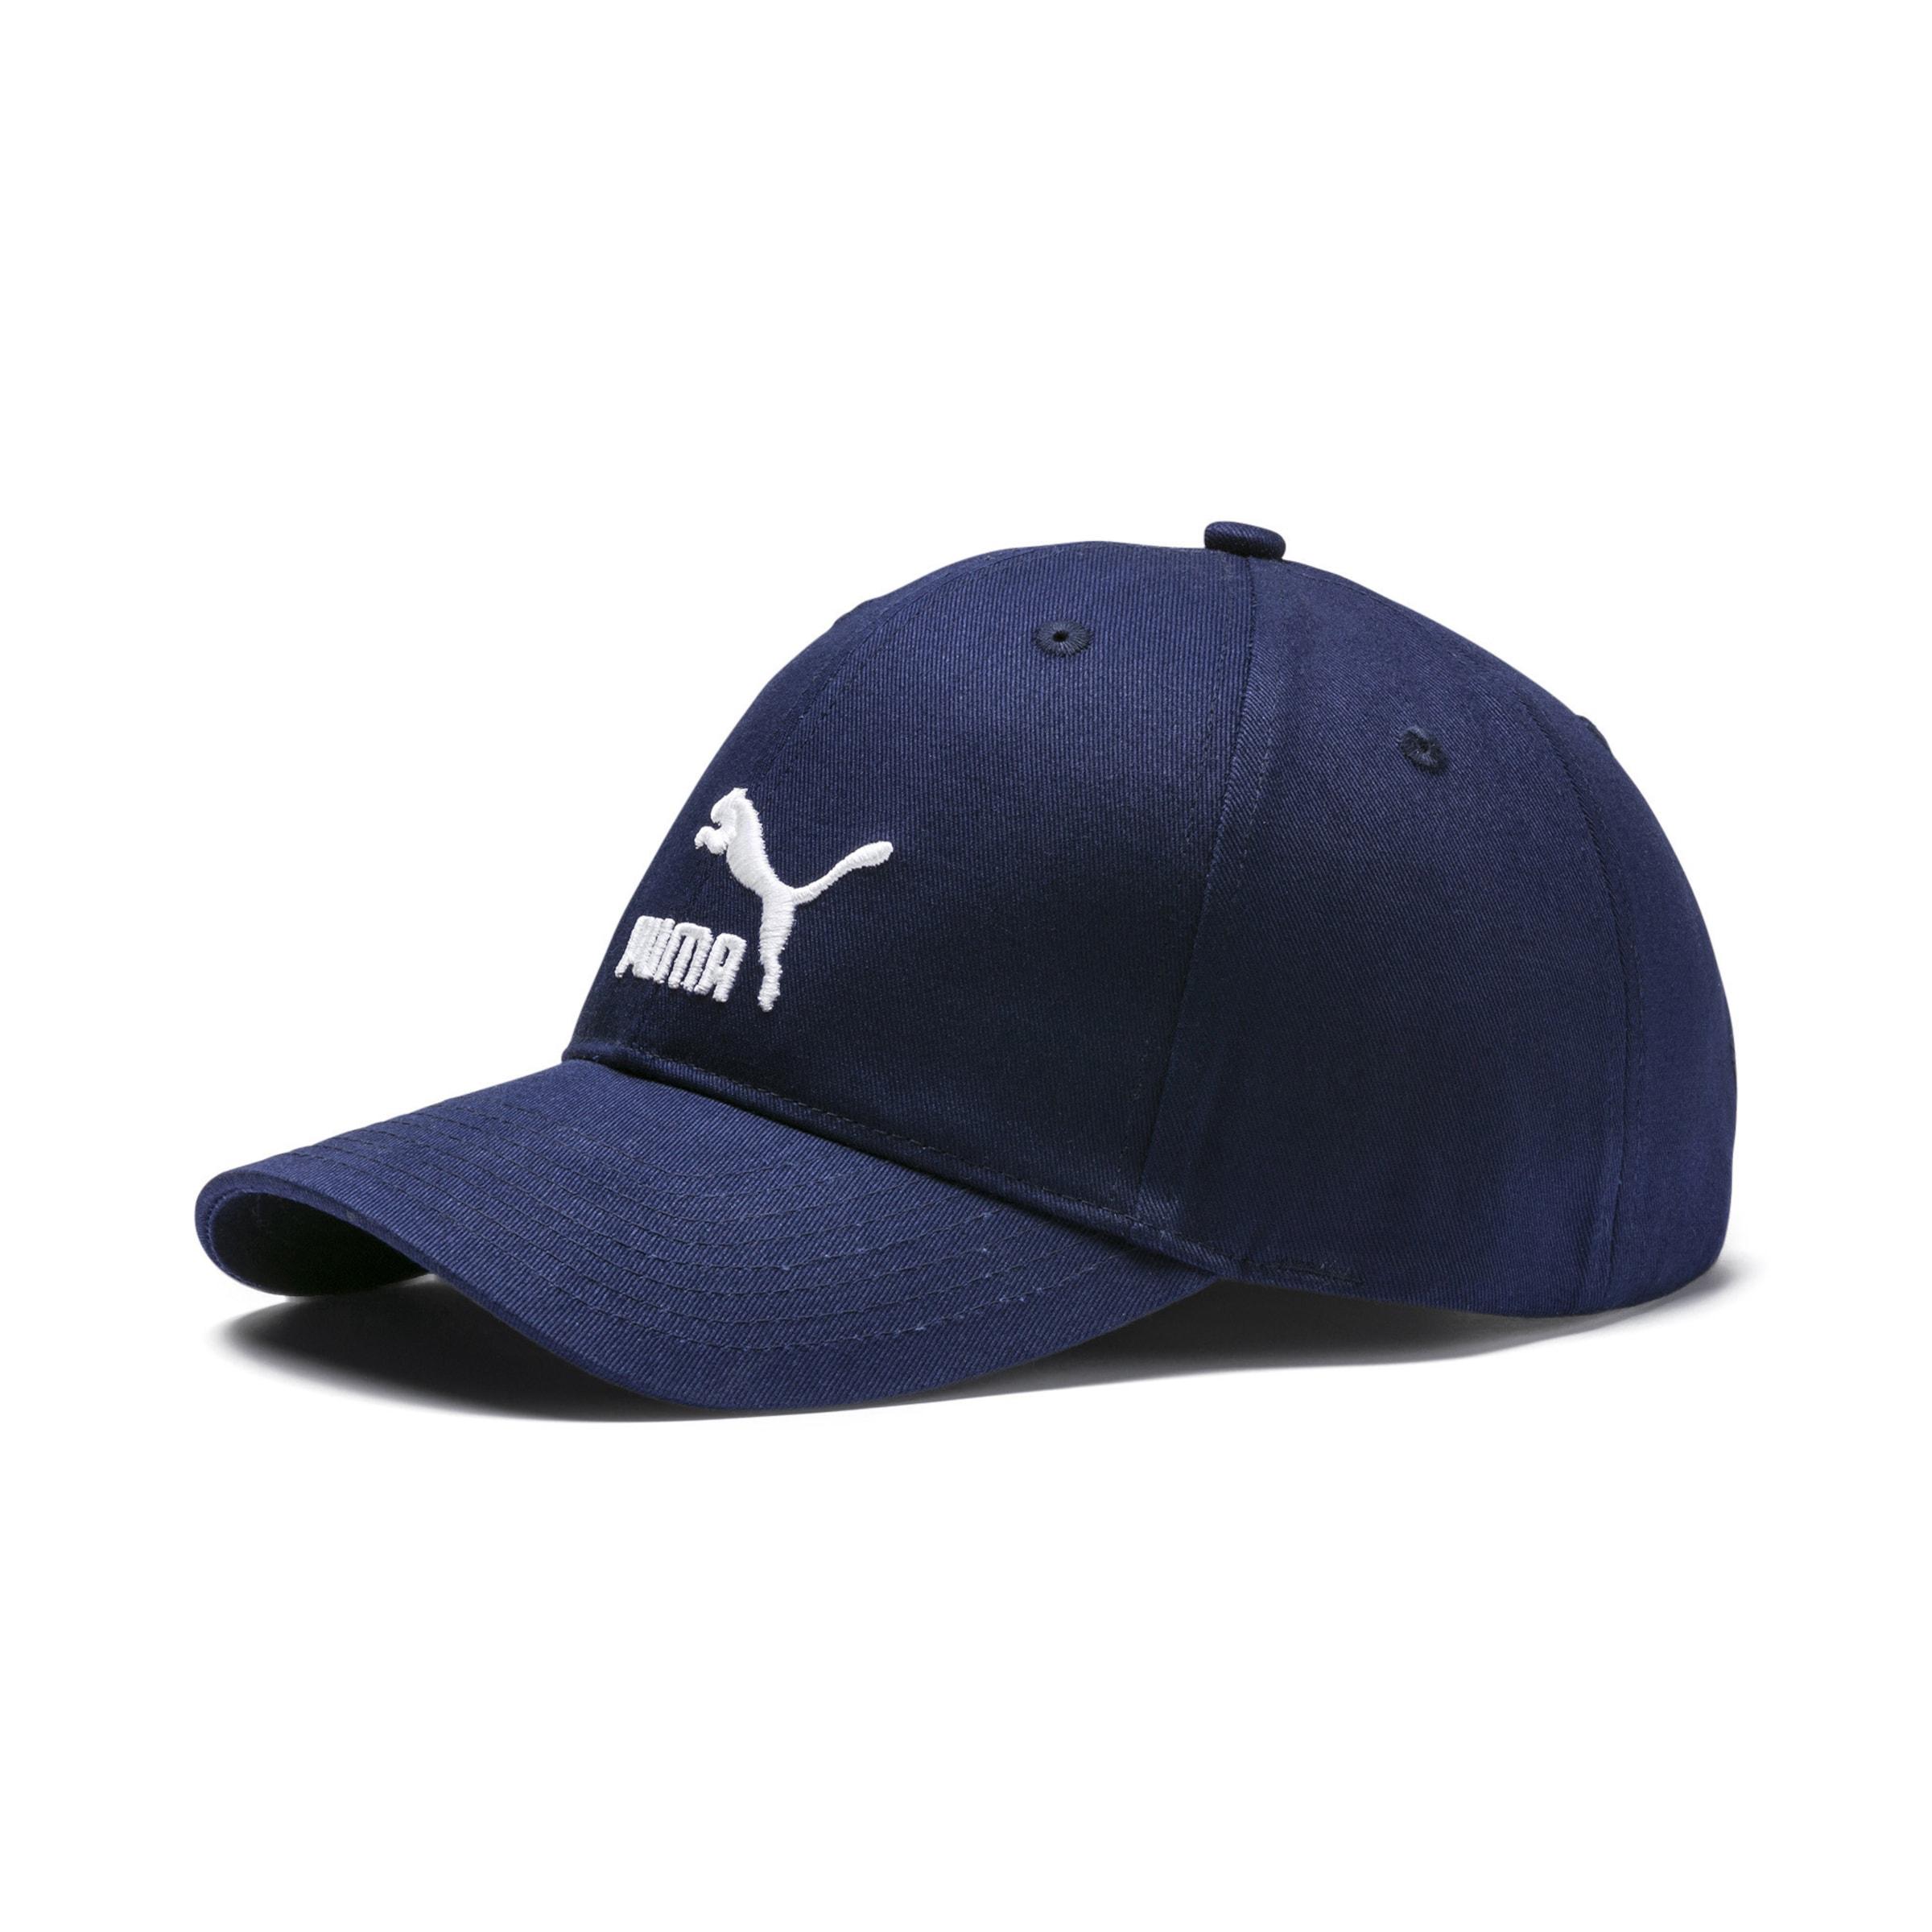 Baseball Cap Puma Baseball Puma NavyWeiß In N0OnZwX8kP